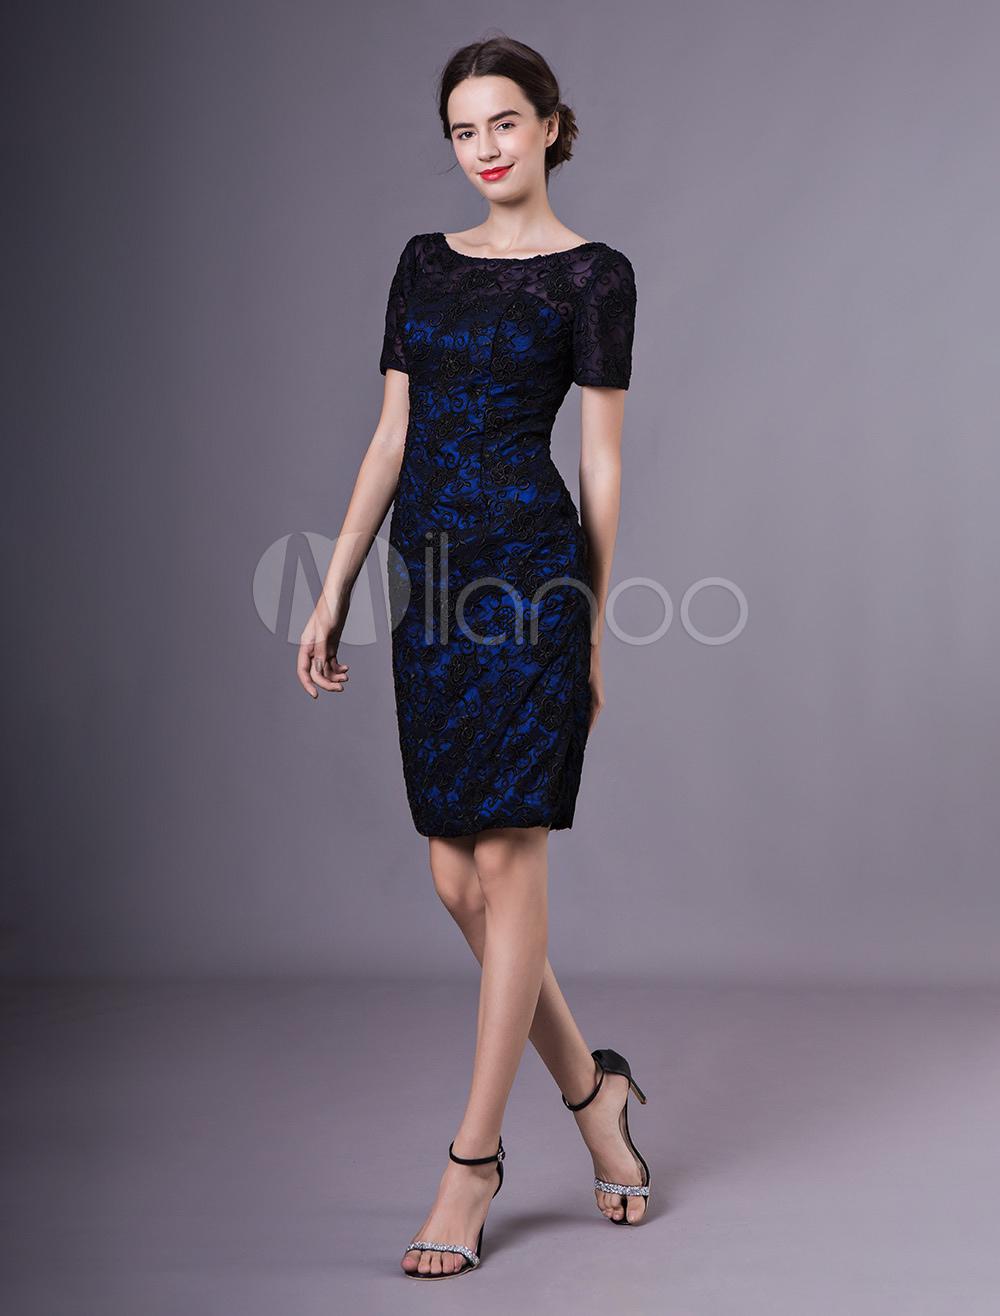 3ef79fc77d1 Tailor Made Jewel Neck Sheath Lace Embellishment Mother Of Bride ...